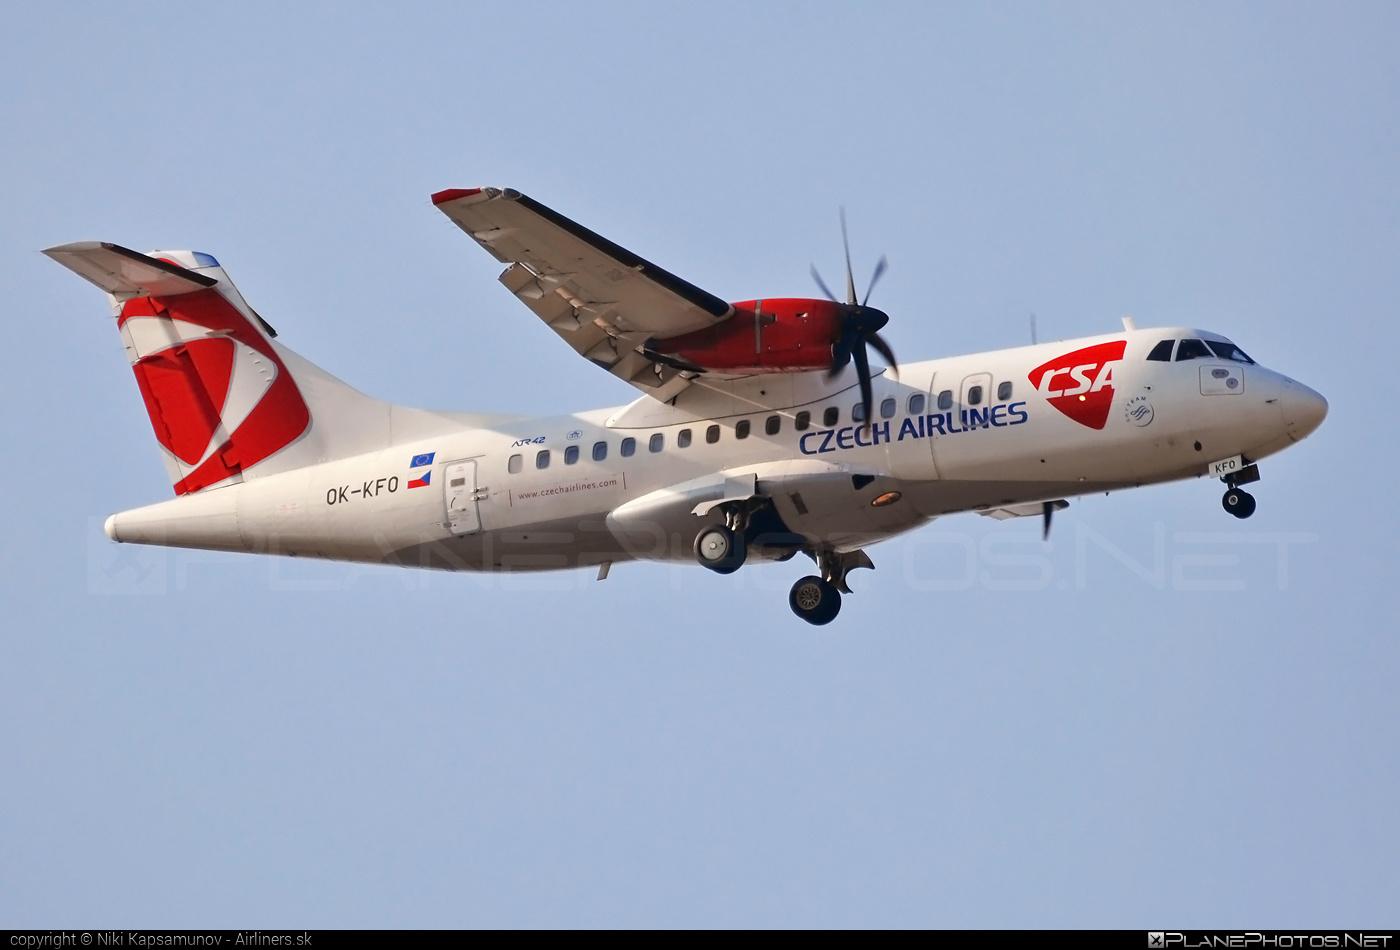 ATR 42-500 - OK-KFO operated by CSA Czech Airlines #atr #atr42 #atr42500 #csa #czechairlines